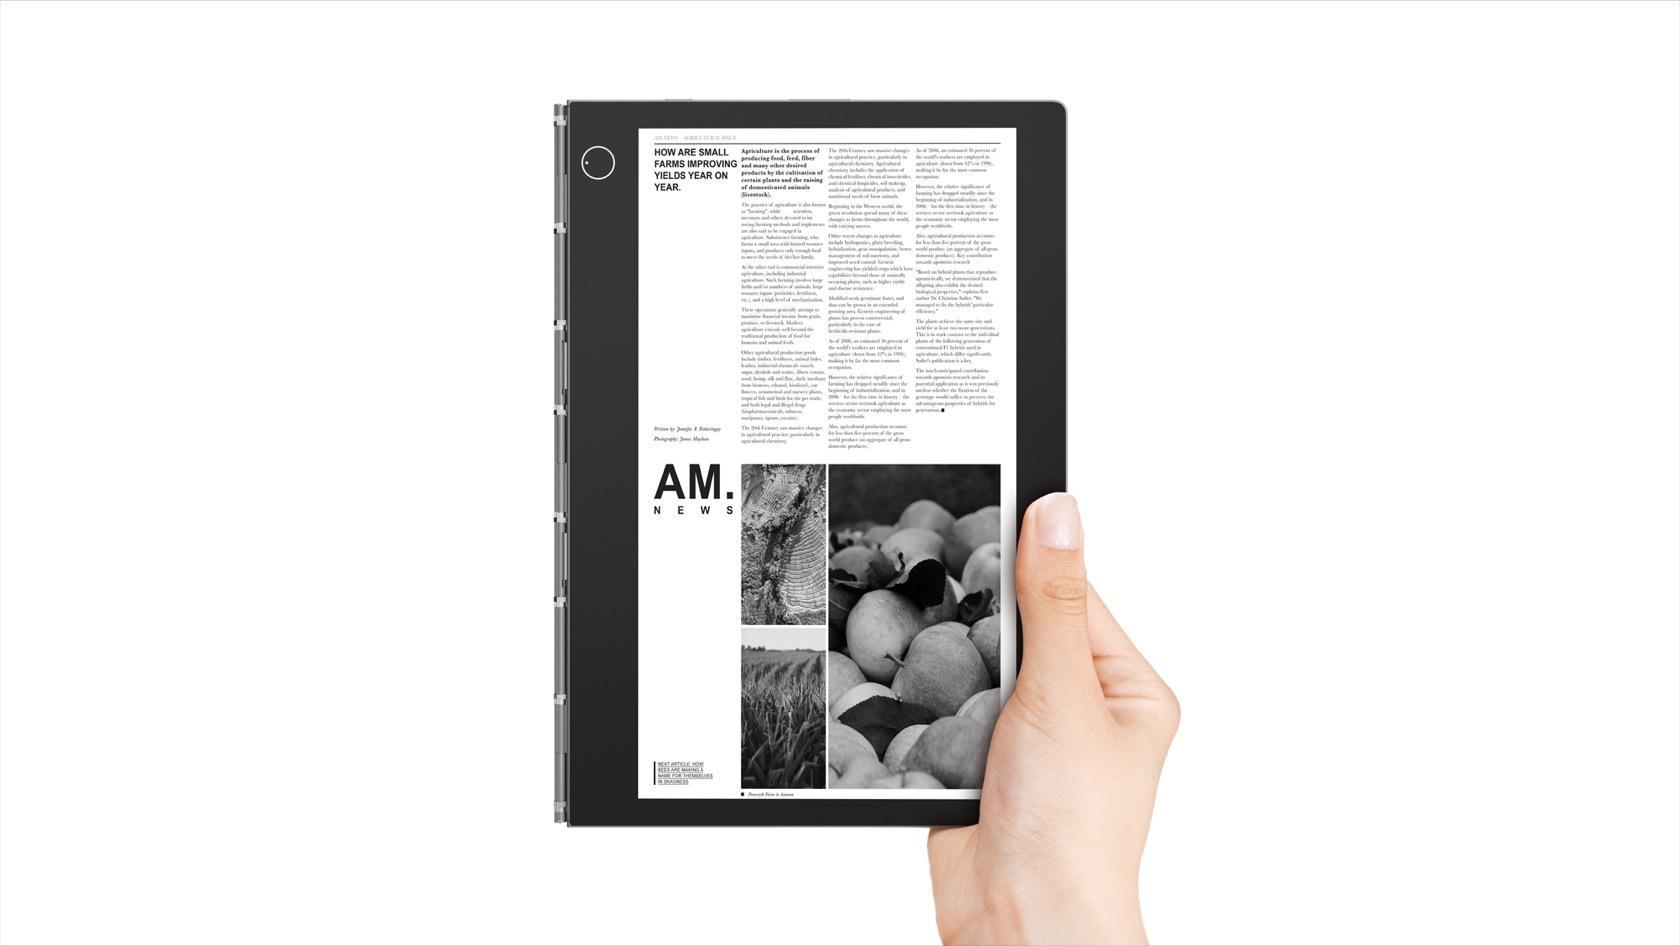 4 gadgets the Lenovo Yoga Book C930 could replace - SlashGear